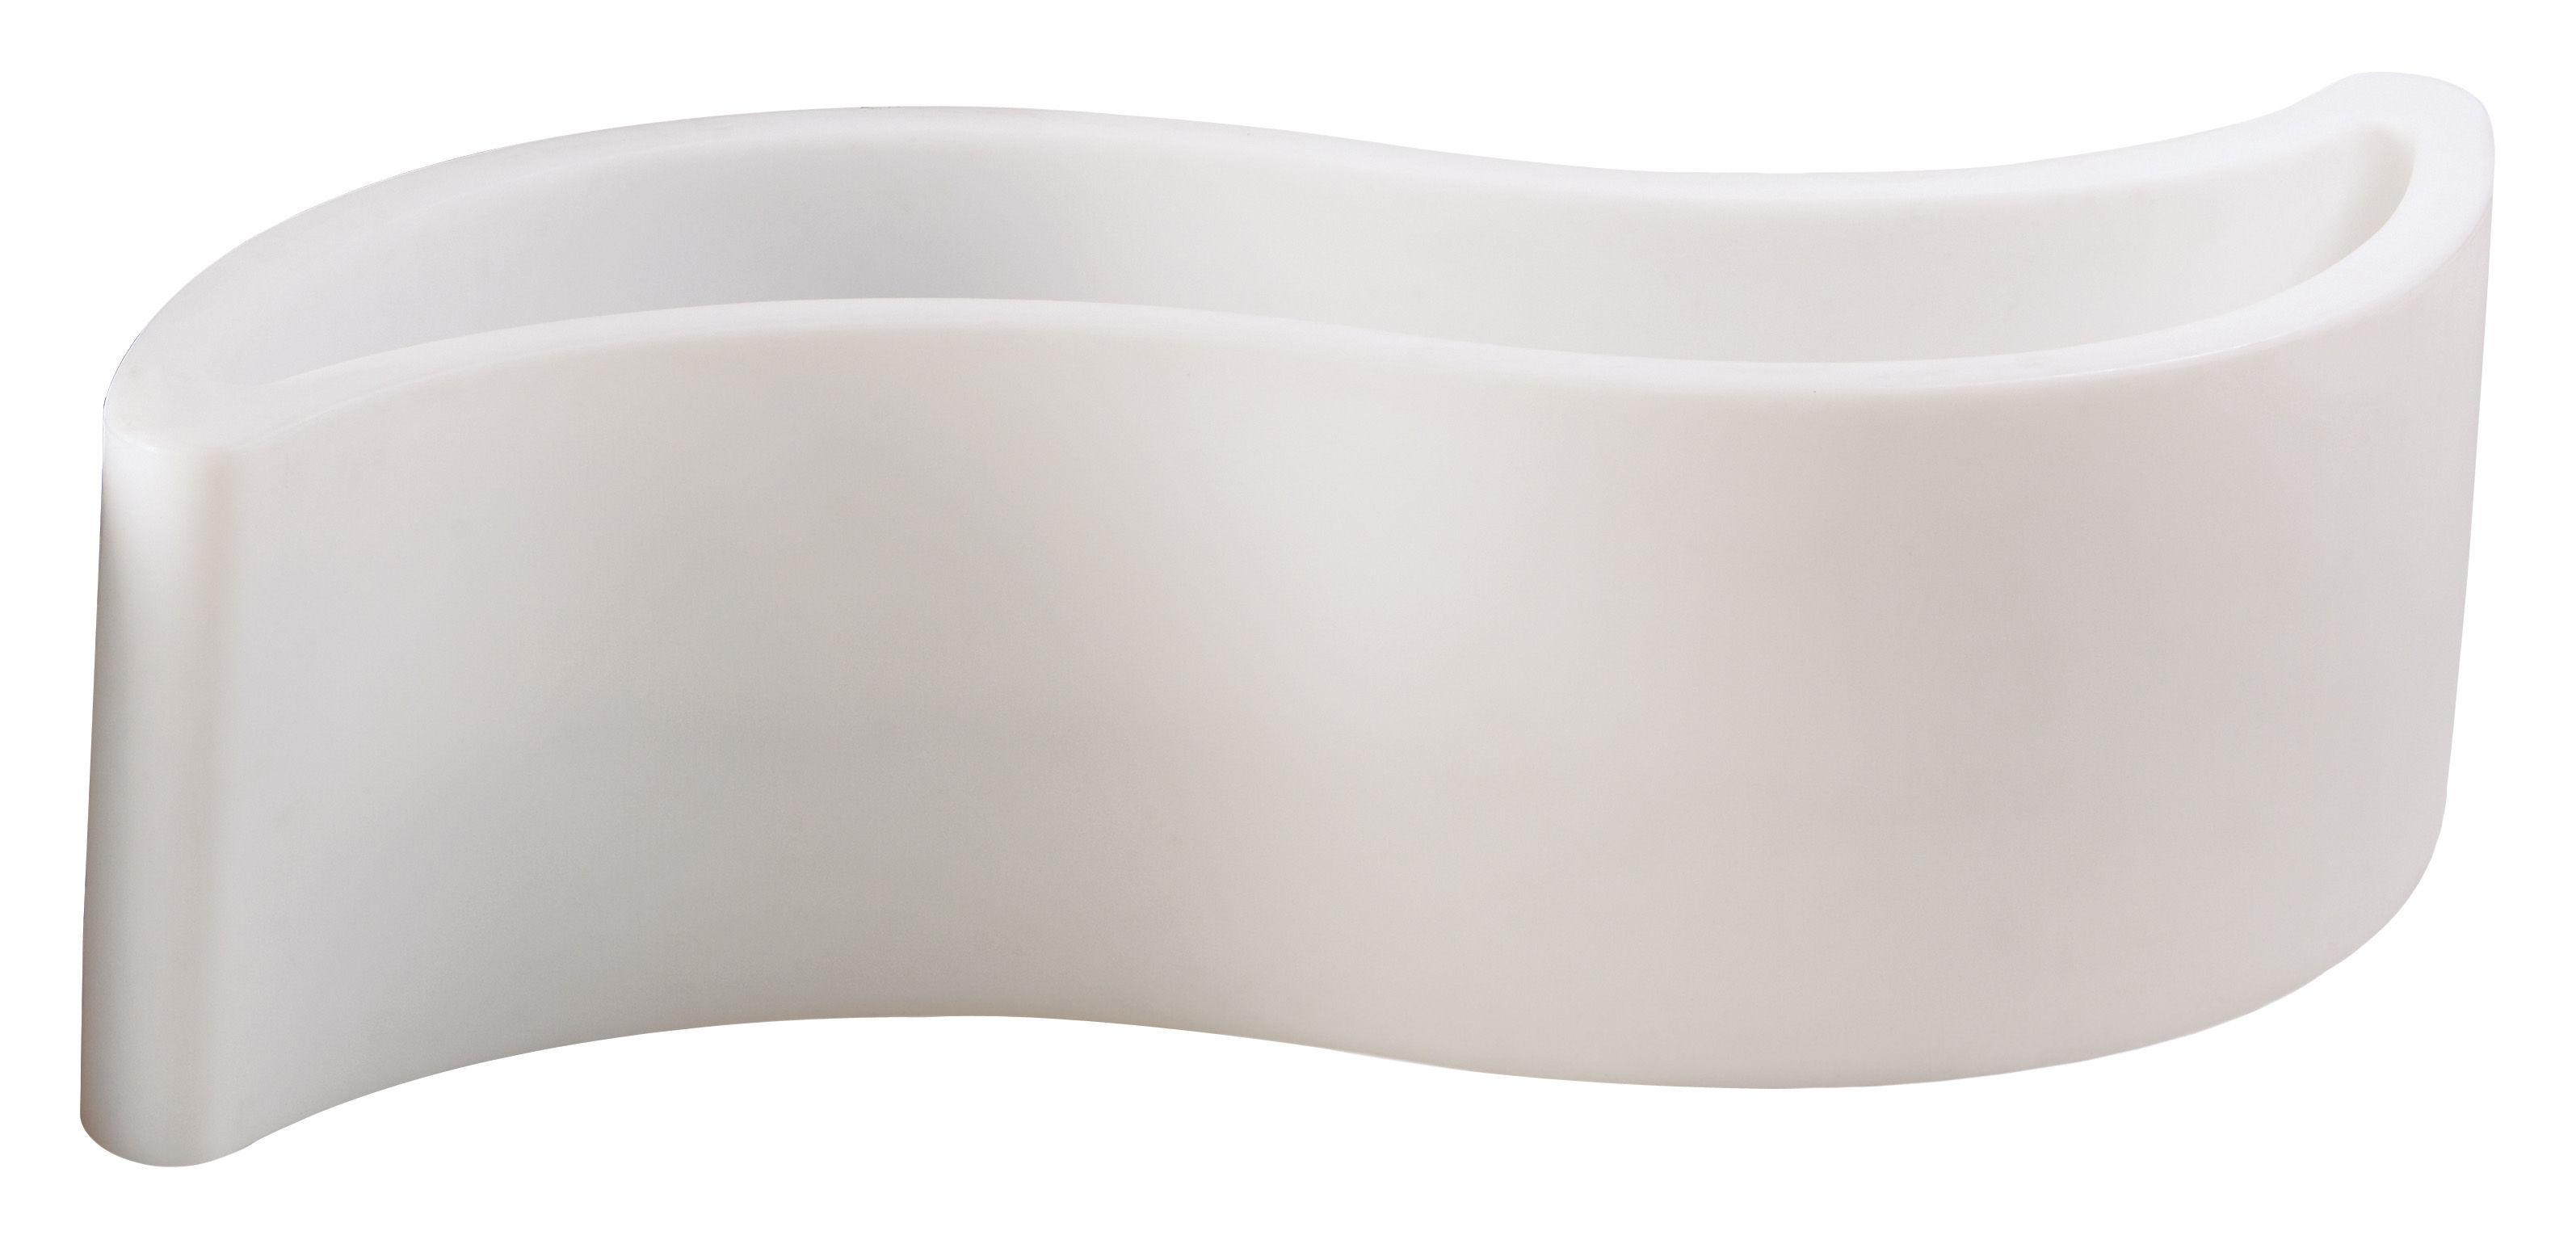 Möbel - Bänke - Wave Blumenkasten /Bank - Slide - Weiß - polyéthène recyclable